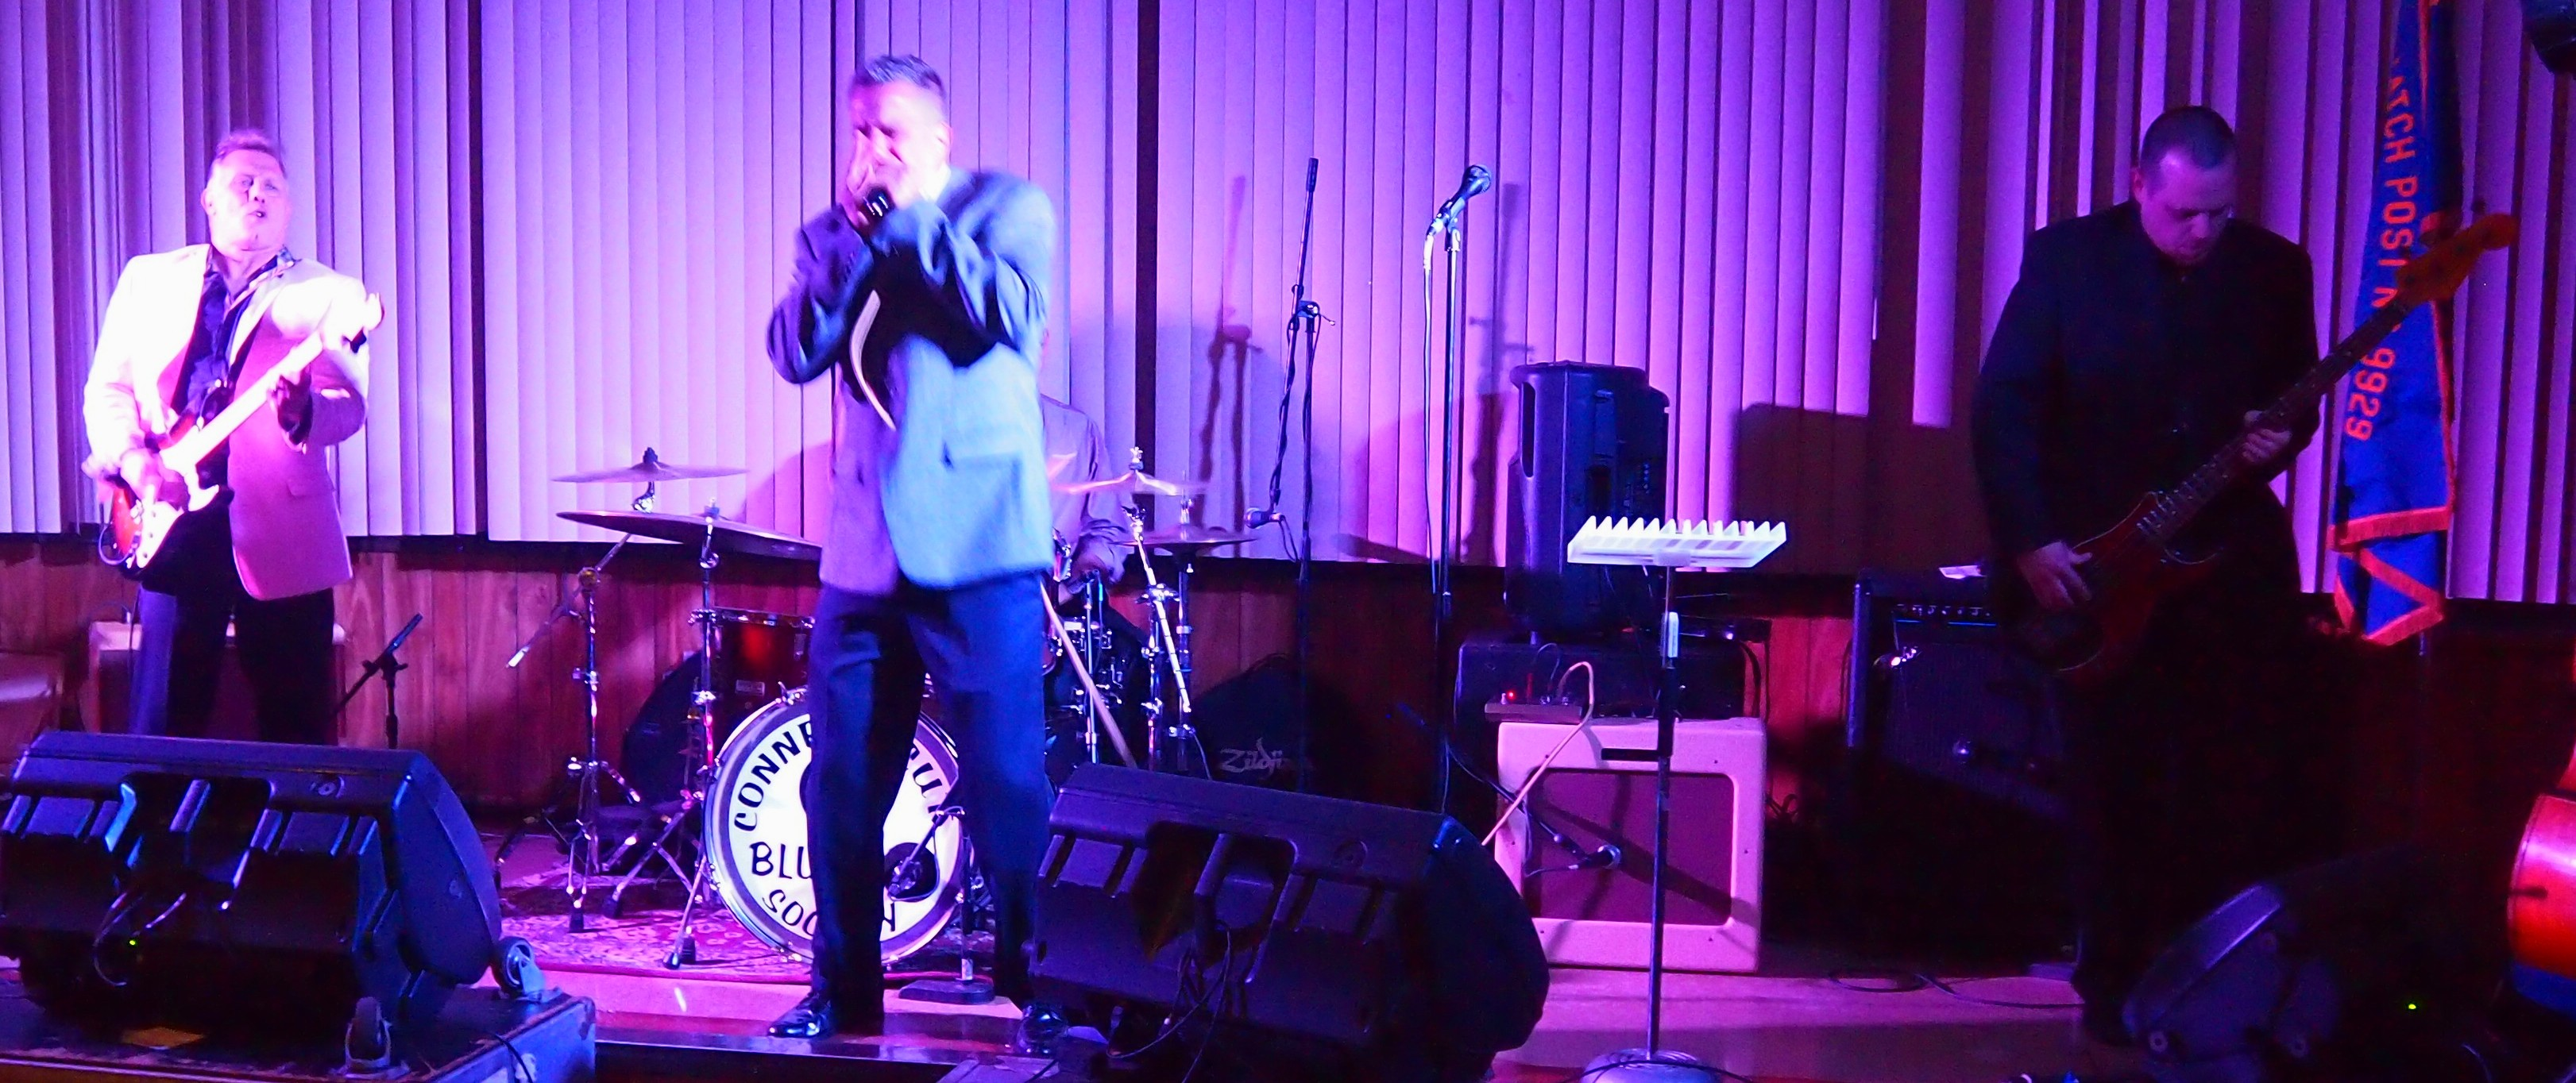 Carl Ricci 706 Union Ave Band 6-11-20161b